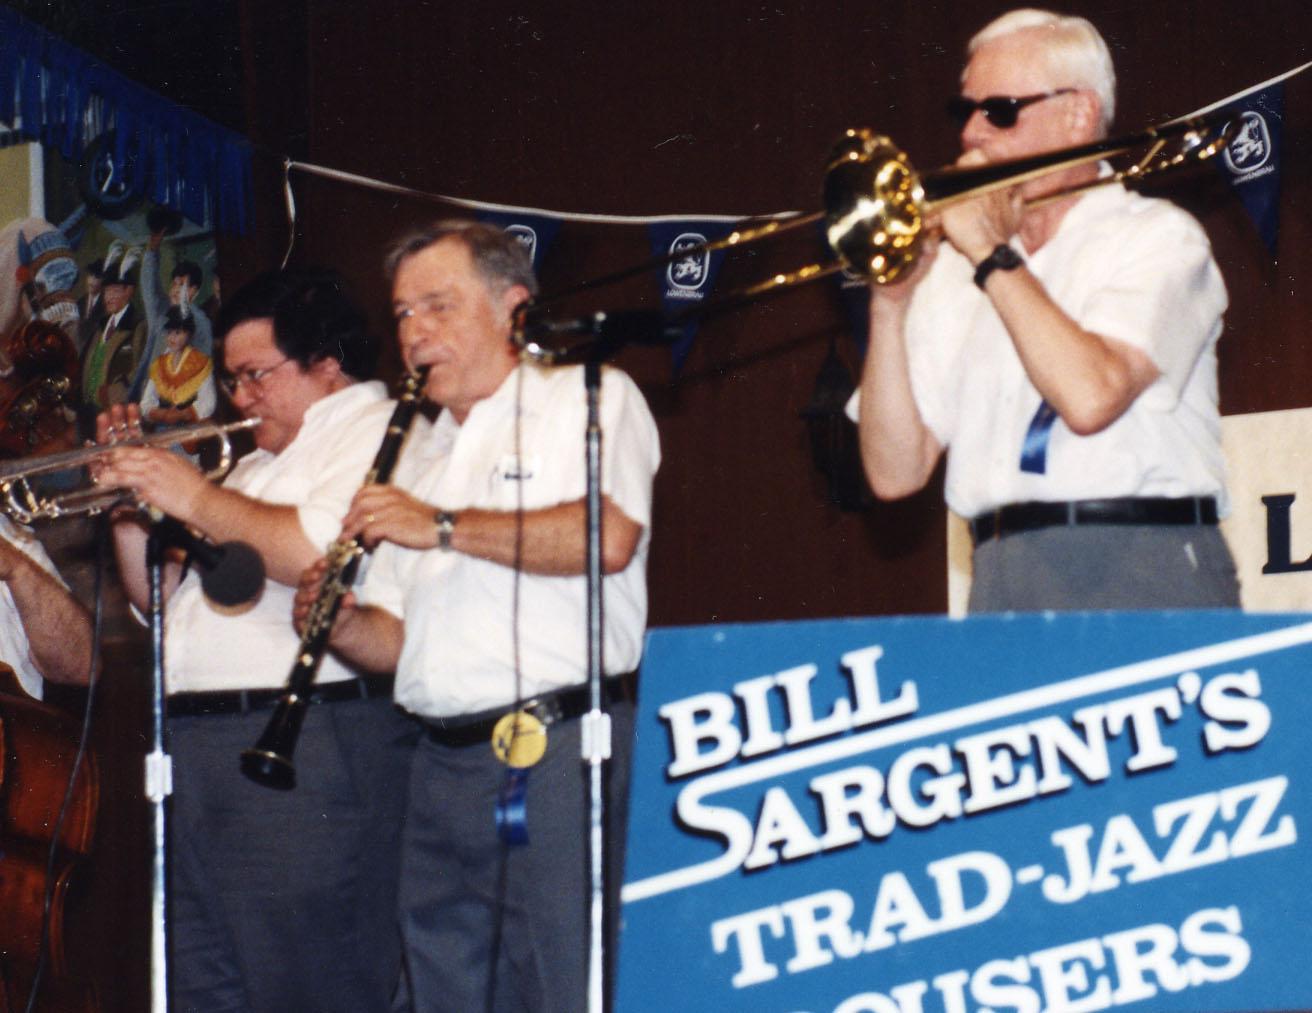 Bill Sargent's Trad-Jazz Rousers Dixieland Band 9 - Jeff Pietrangelo, Kim Cusak &Amp; Herb Draeger